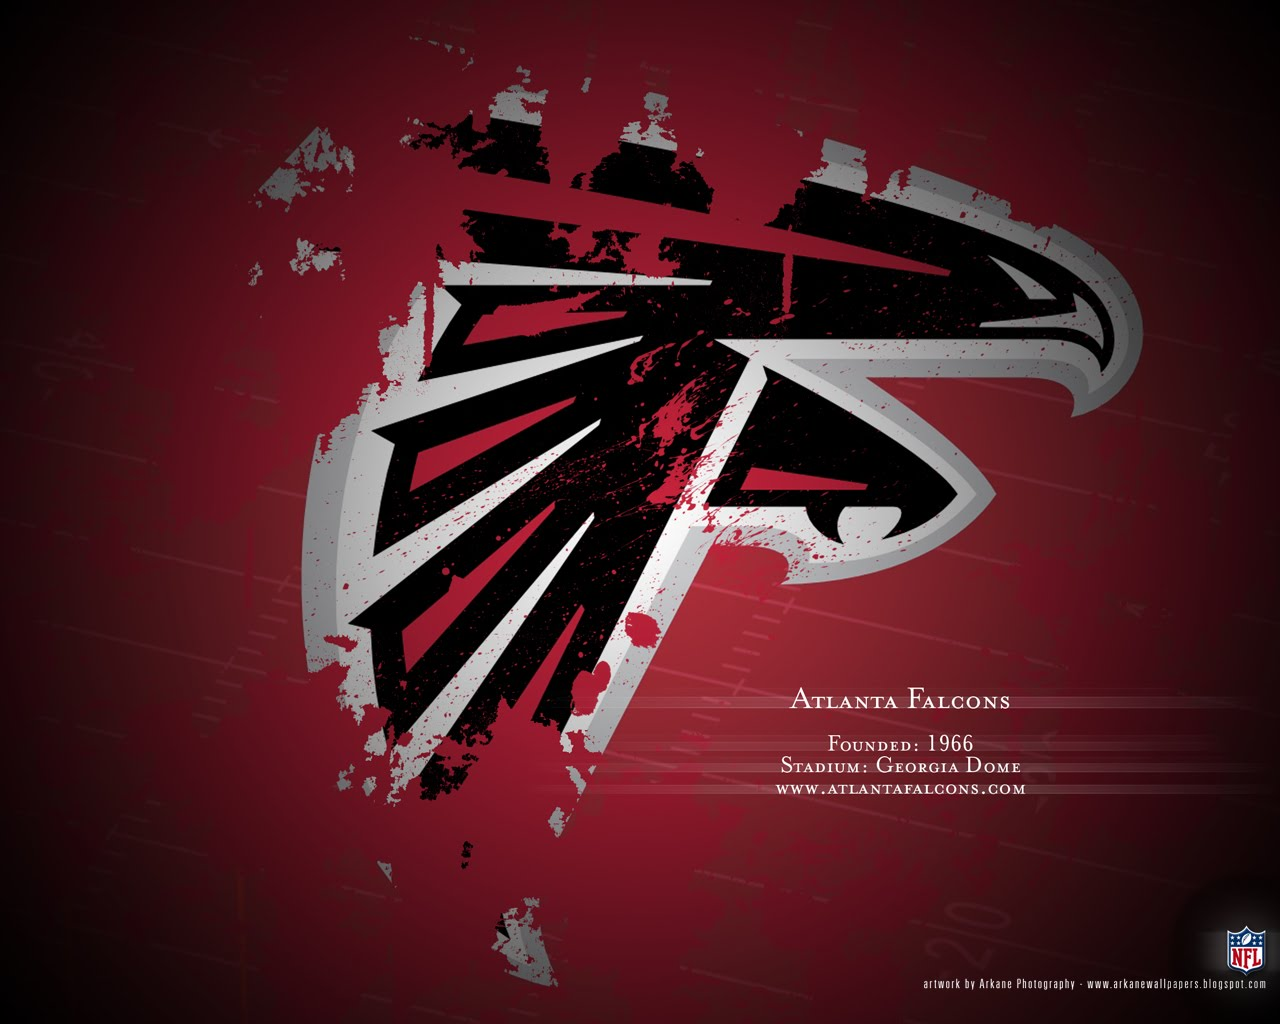 Arkane NFL Wallpapers Profile   Atlanta Falcons 1280x1024